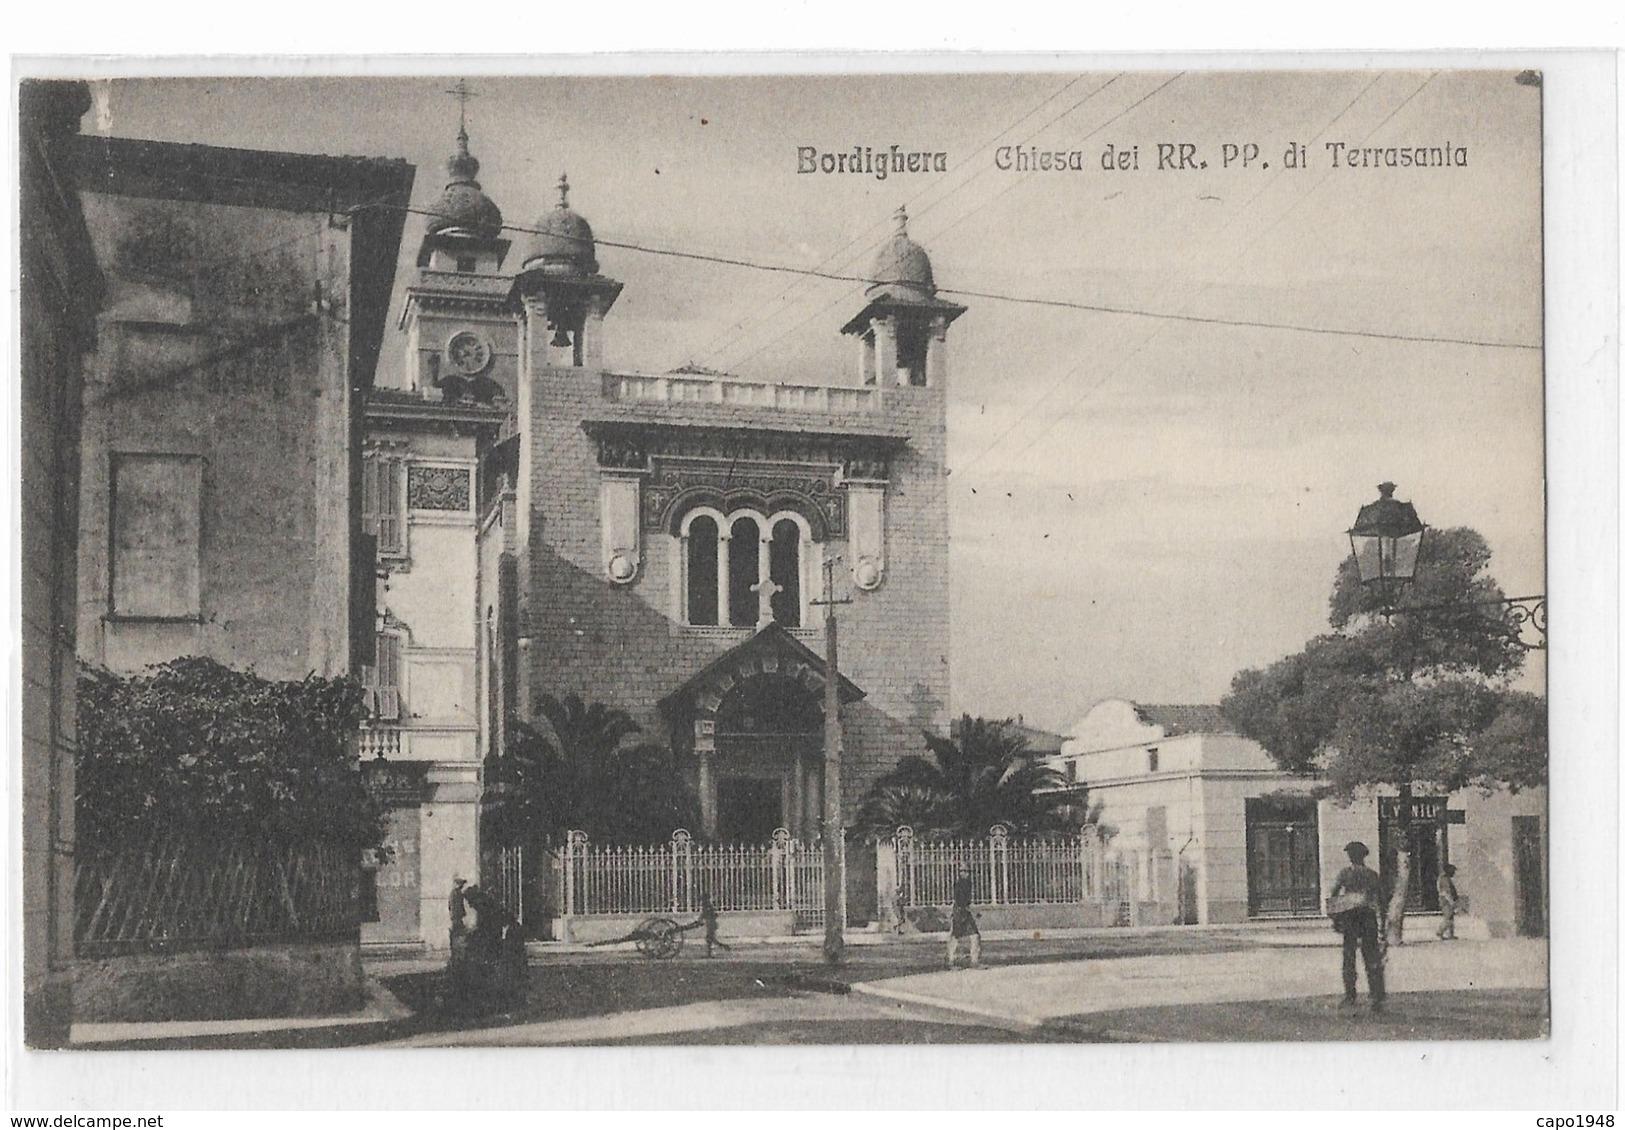 CARD  BORDIGHERA  CHIESA DEI RR.PP.DI TERRASANTA    (IMPERIA)-FP-N -2-   0882-28508 - Imperia